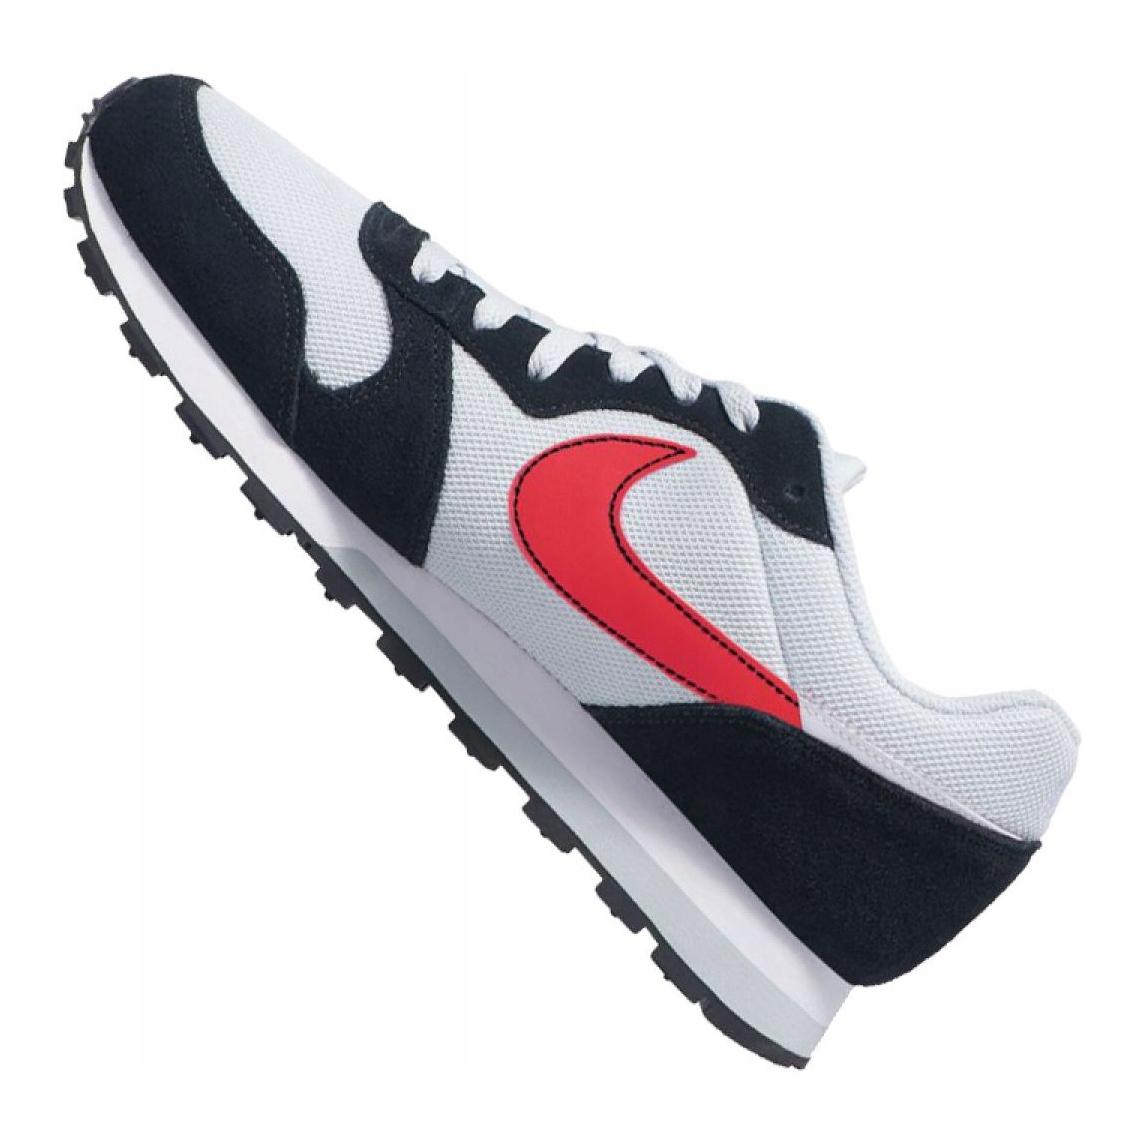 Zapatillas Nike Md Runner 2 ES1 M CI2232 001